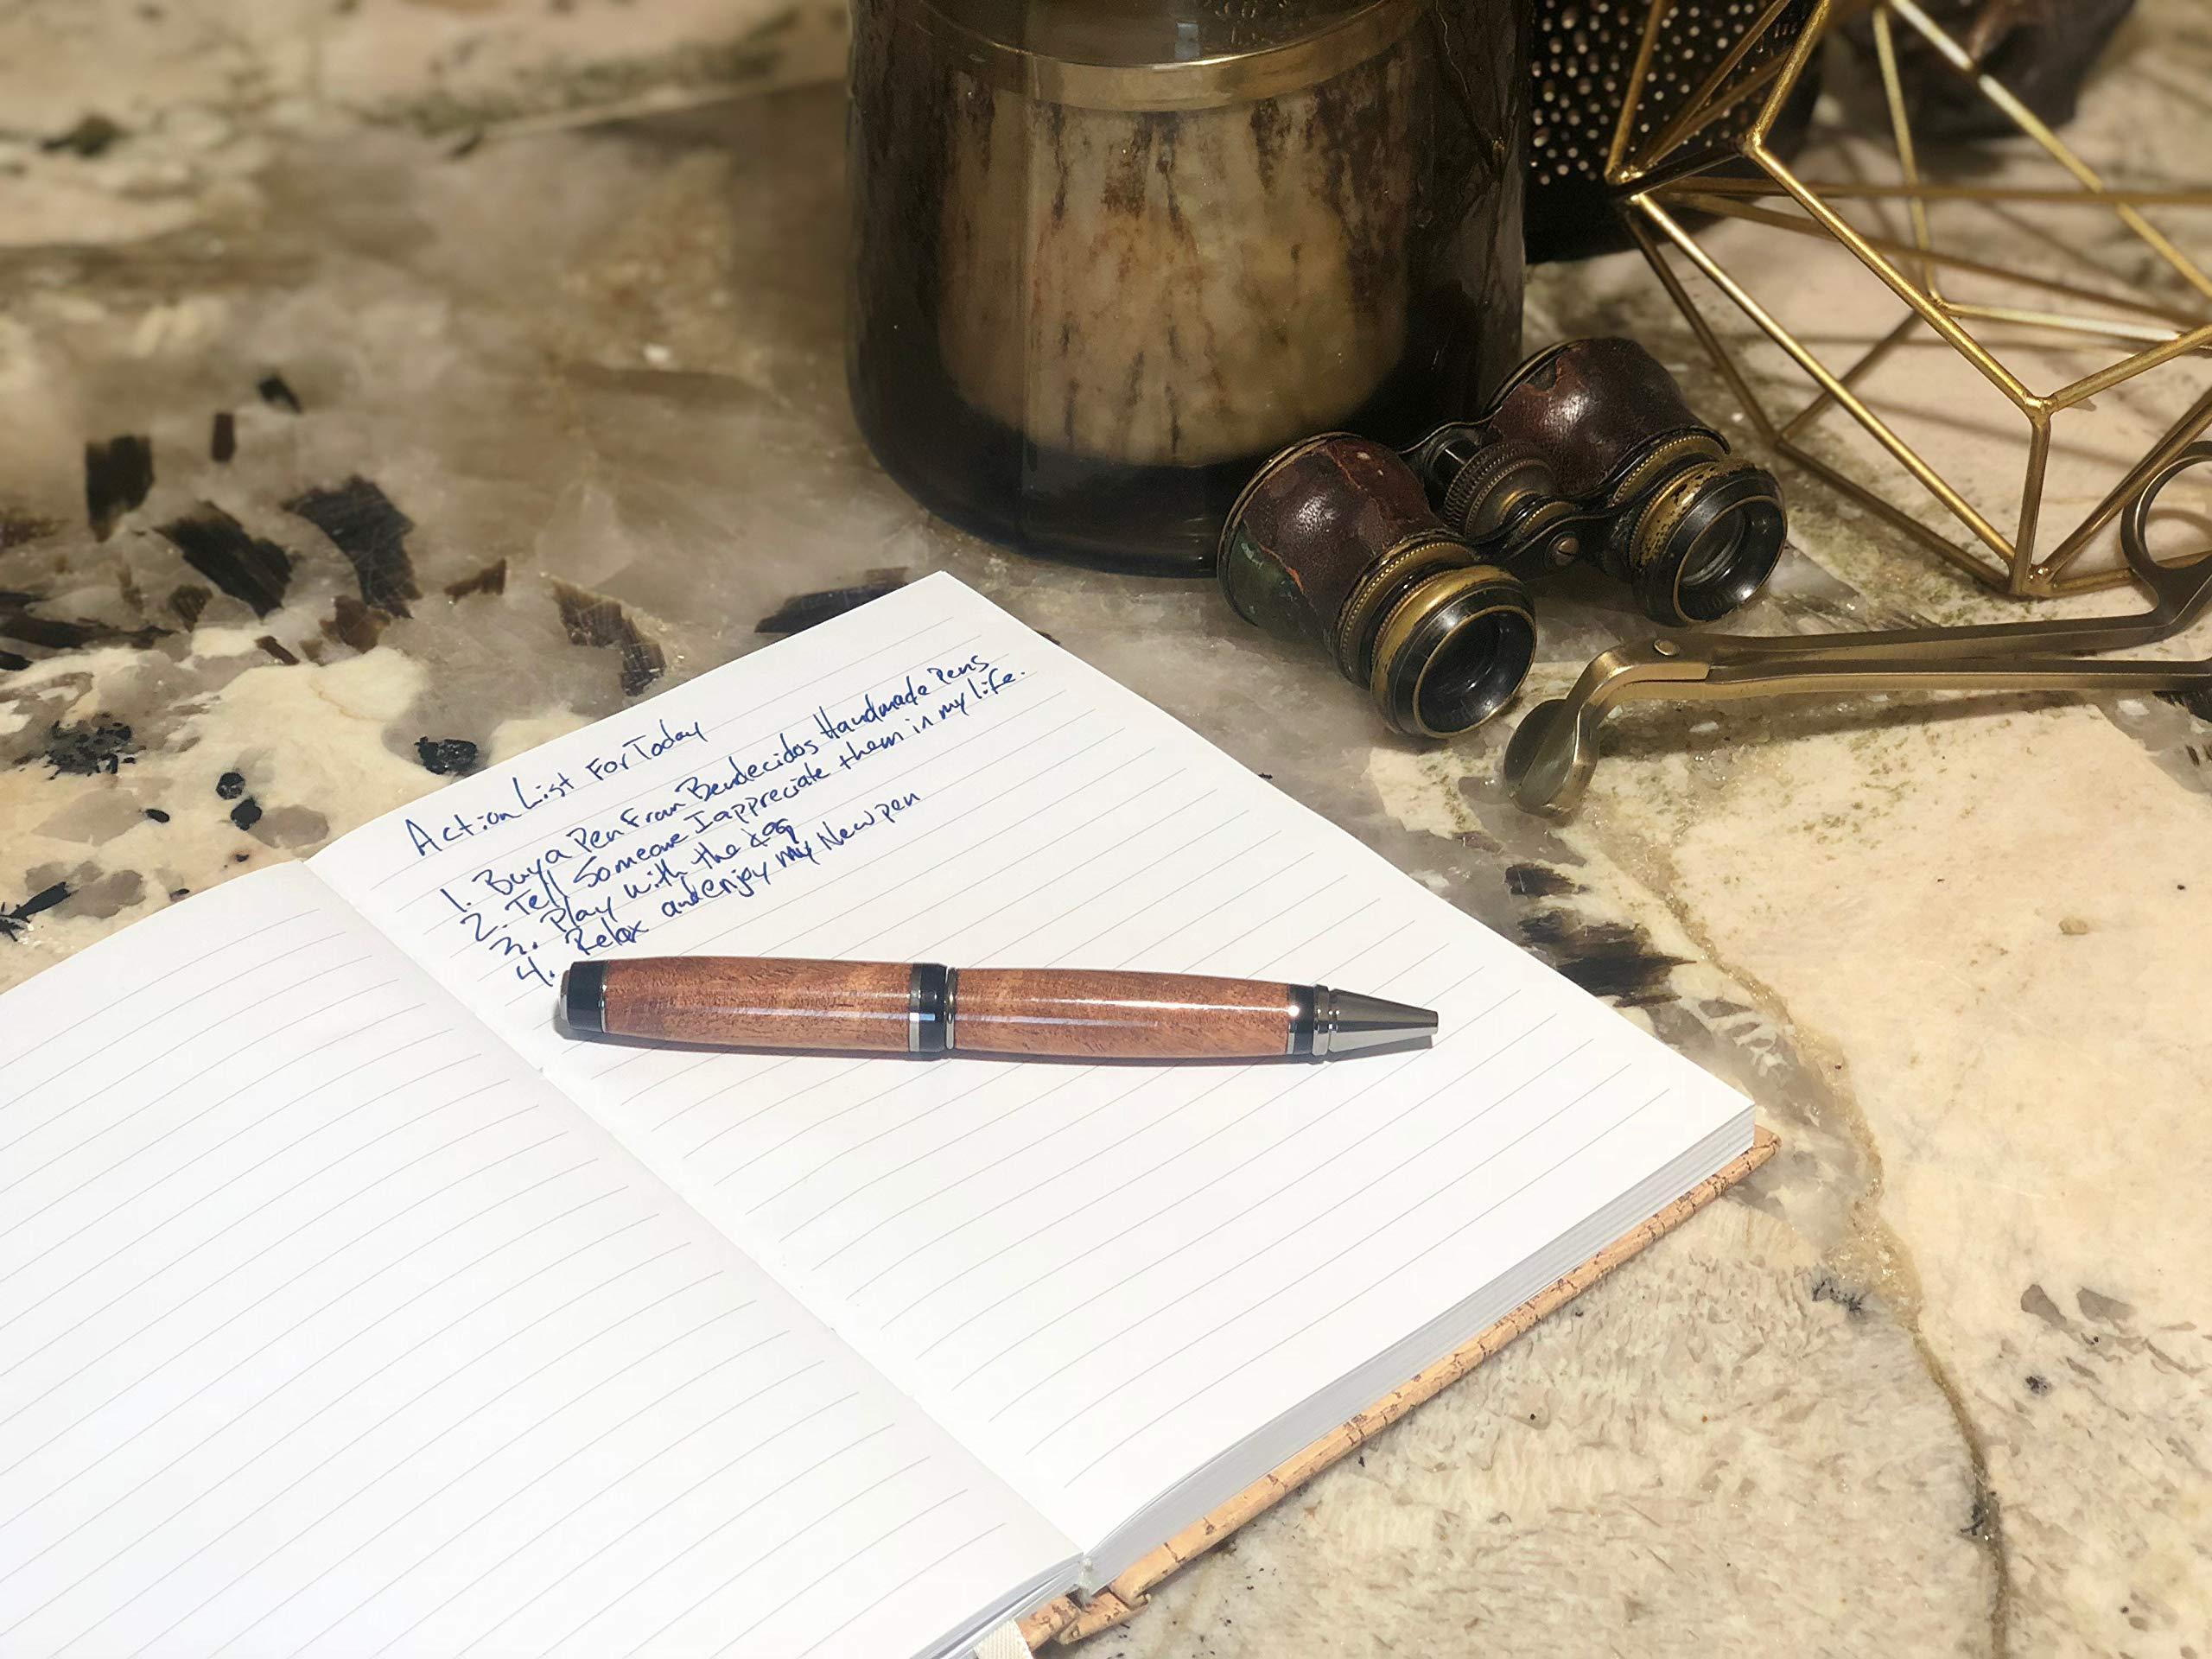 Bendecidos Pens Handmade Pens Texas Mesquite Wood, Black Titanium Plating by Bendecidos Pens (Image #9)